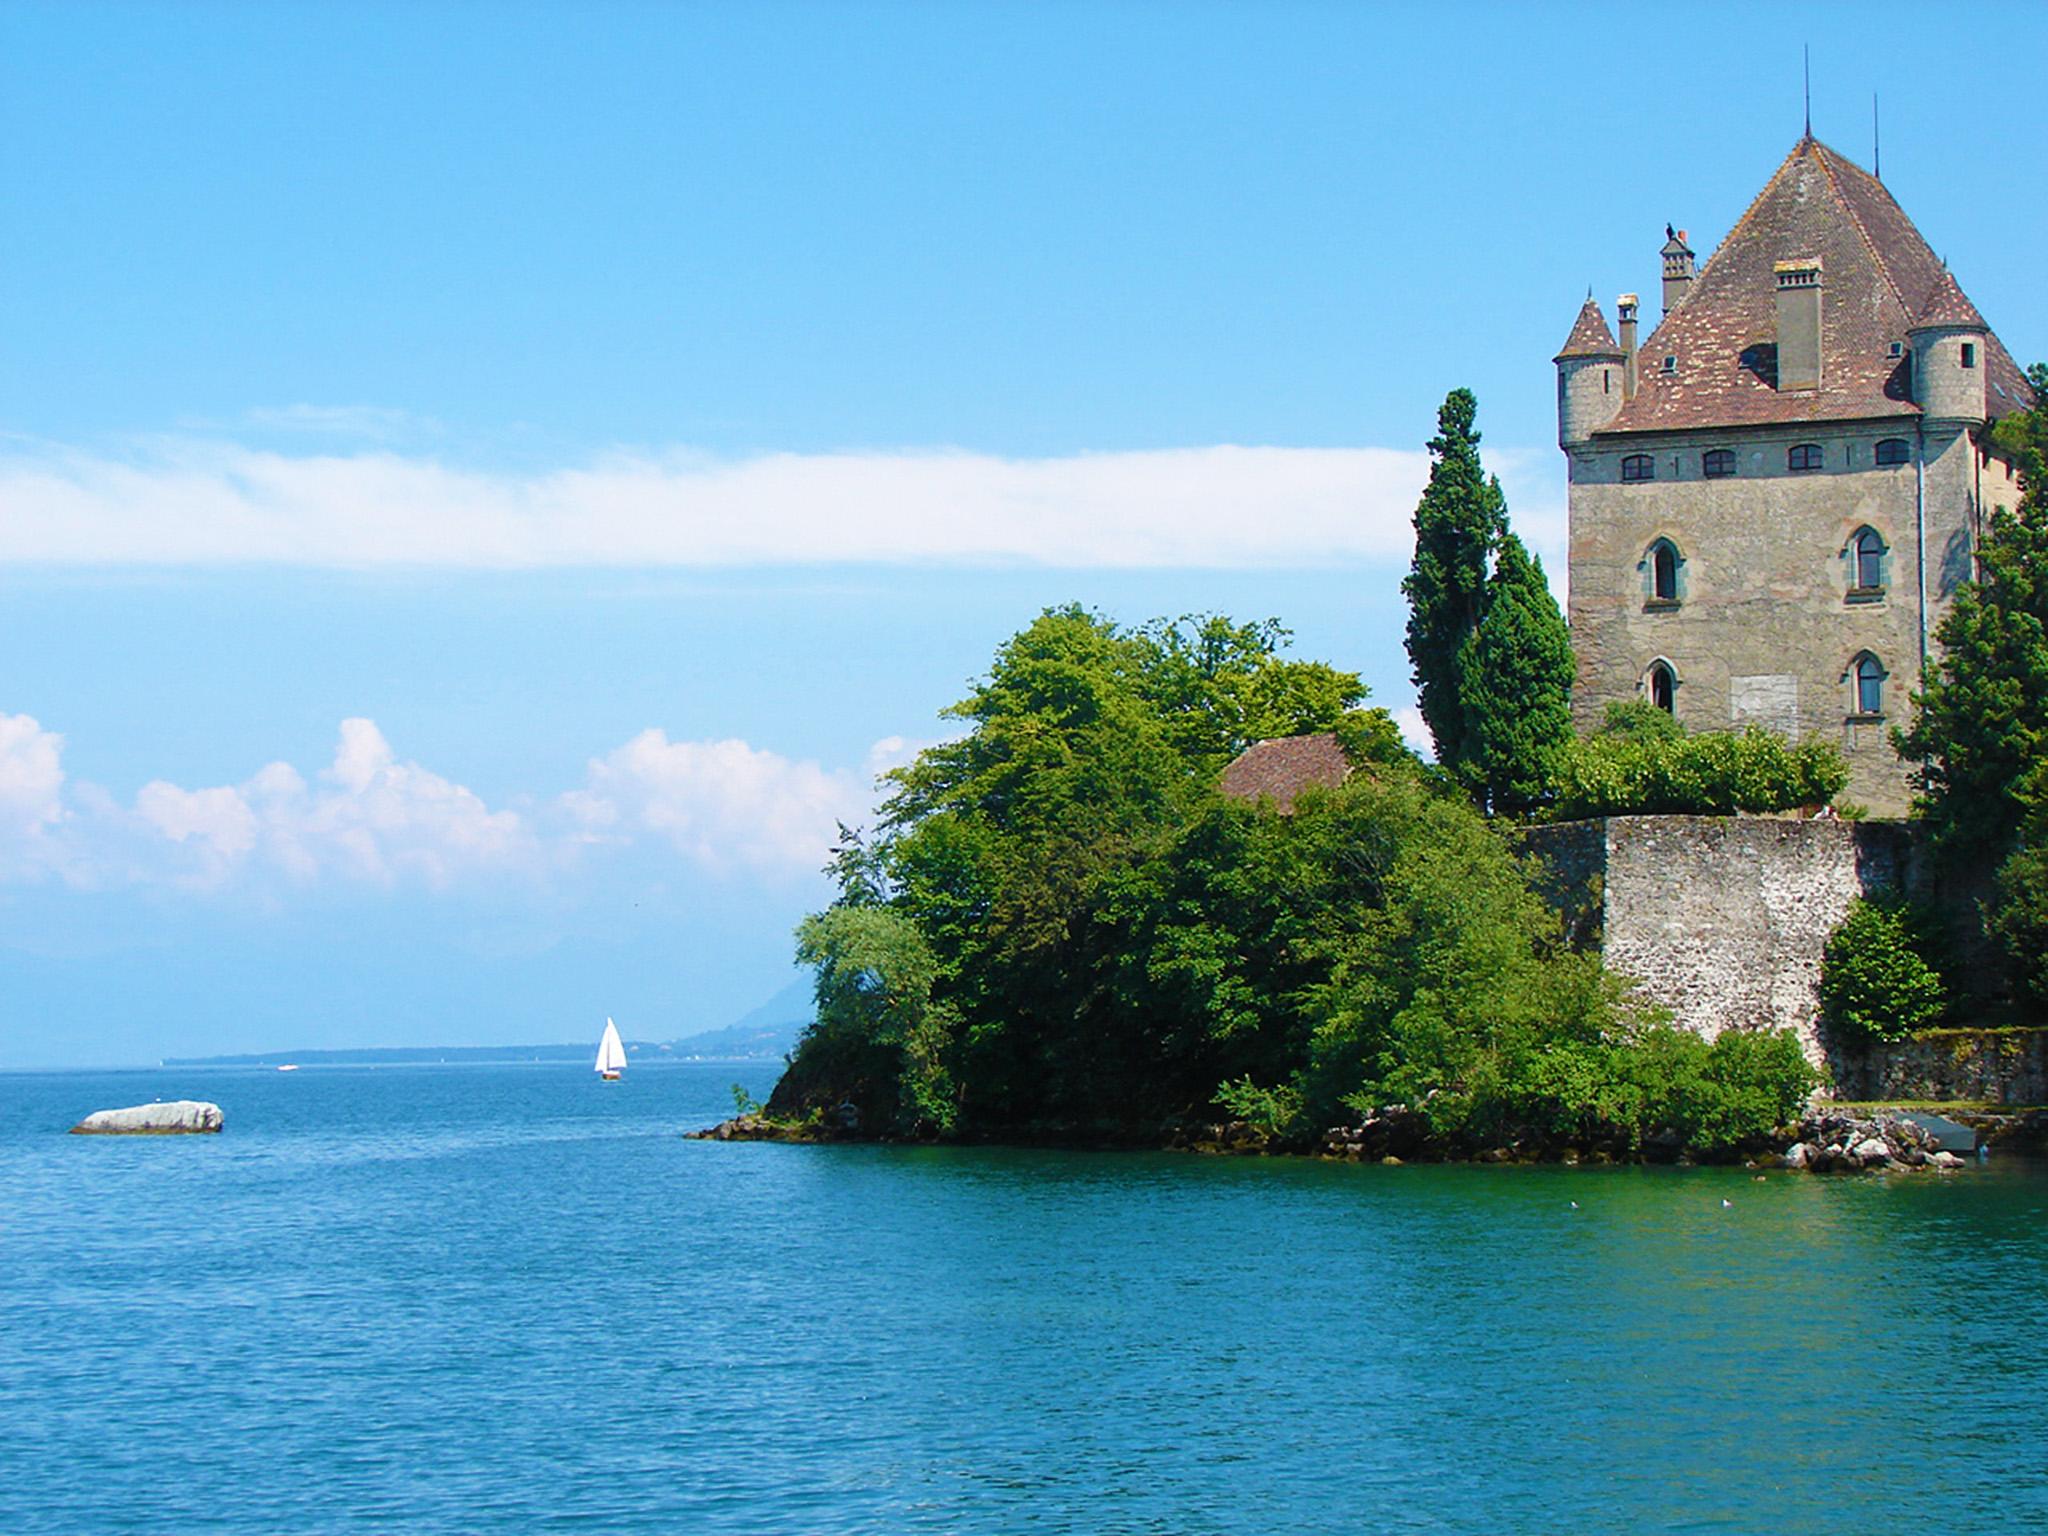 kt_2020_380_Keytours_excursions_Swisstours_yvoire_chateau3_2048_10